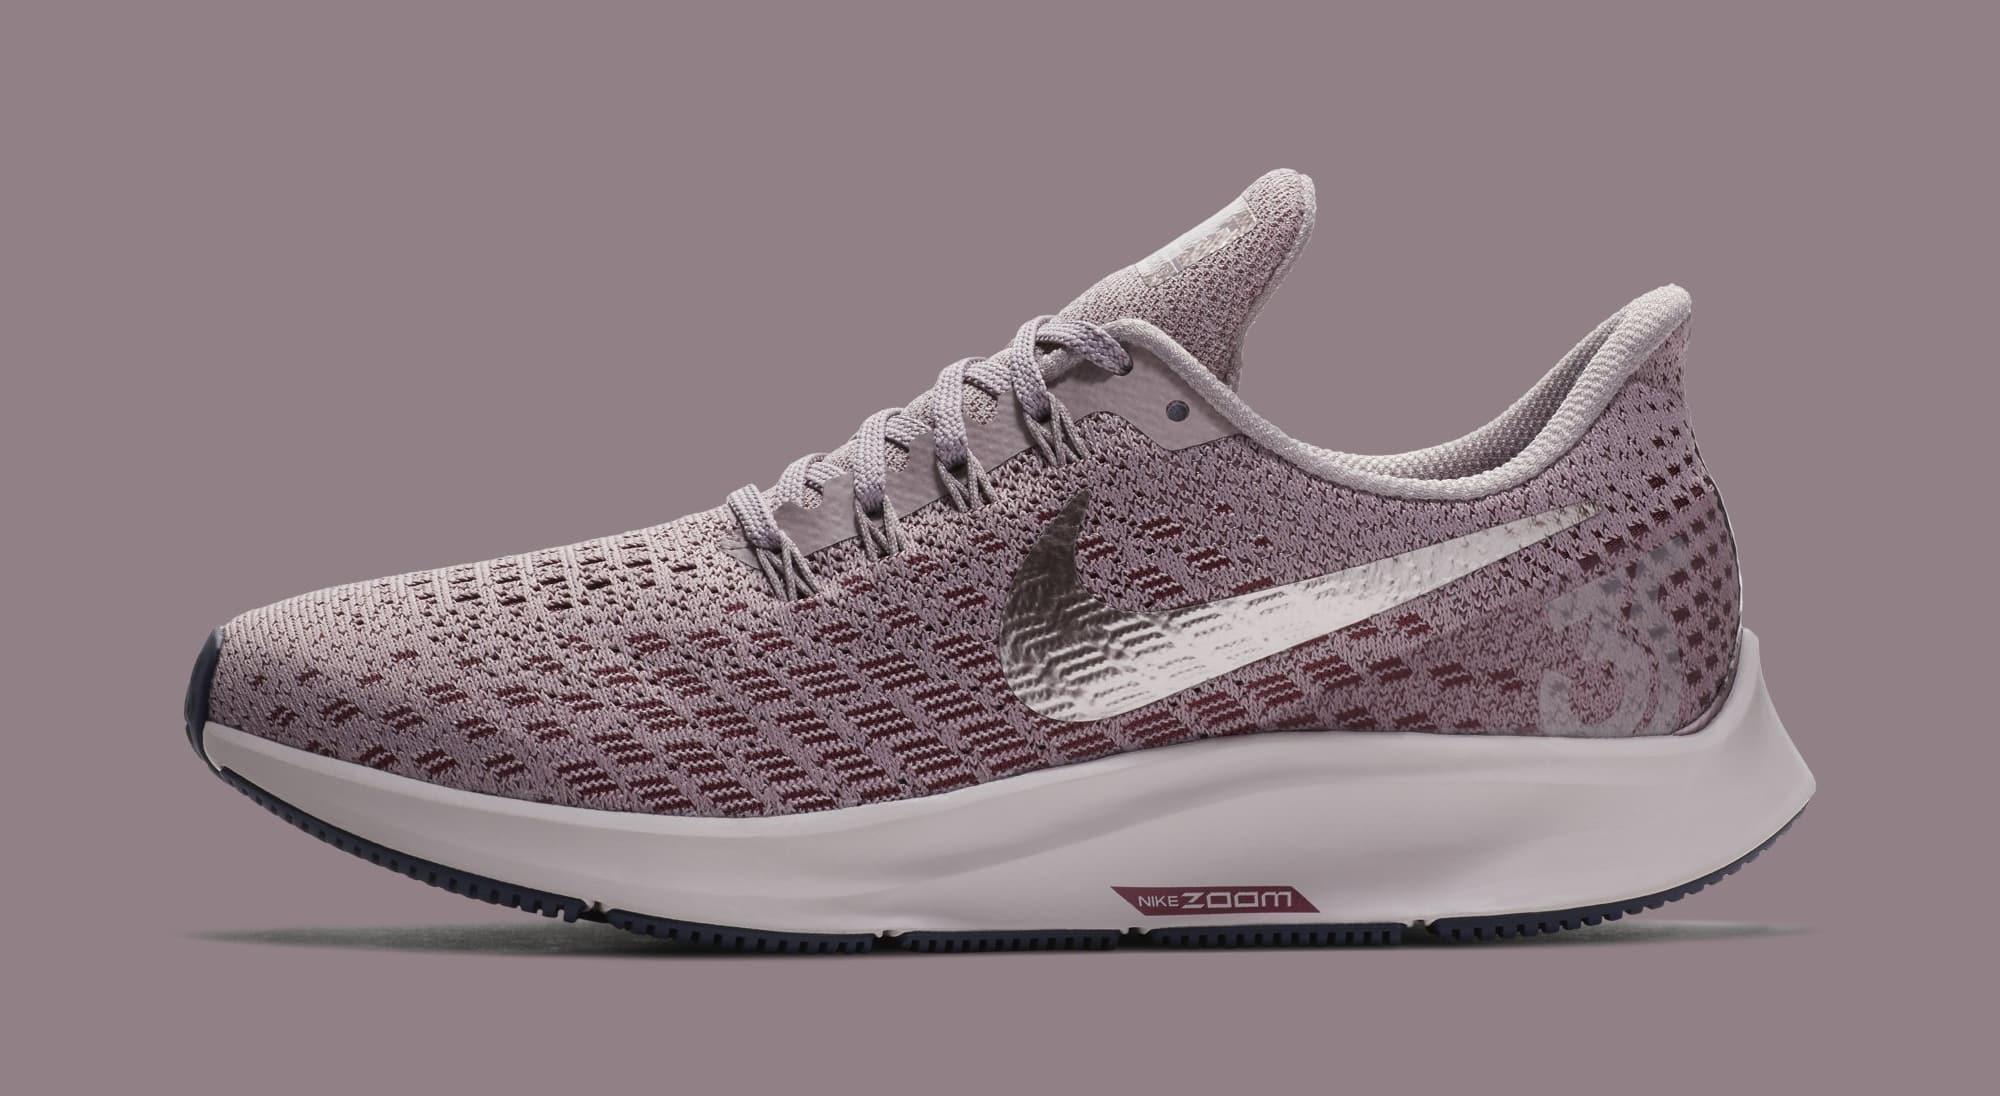 f55d28dad6 ... Pegasus 35 Nike Feminino. 4 5 6 7 8 9